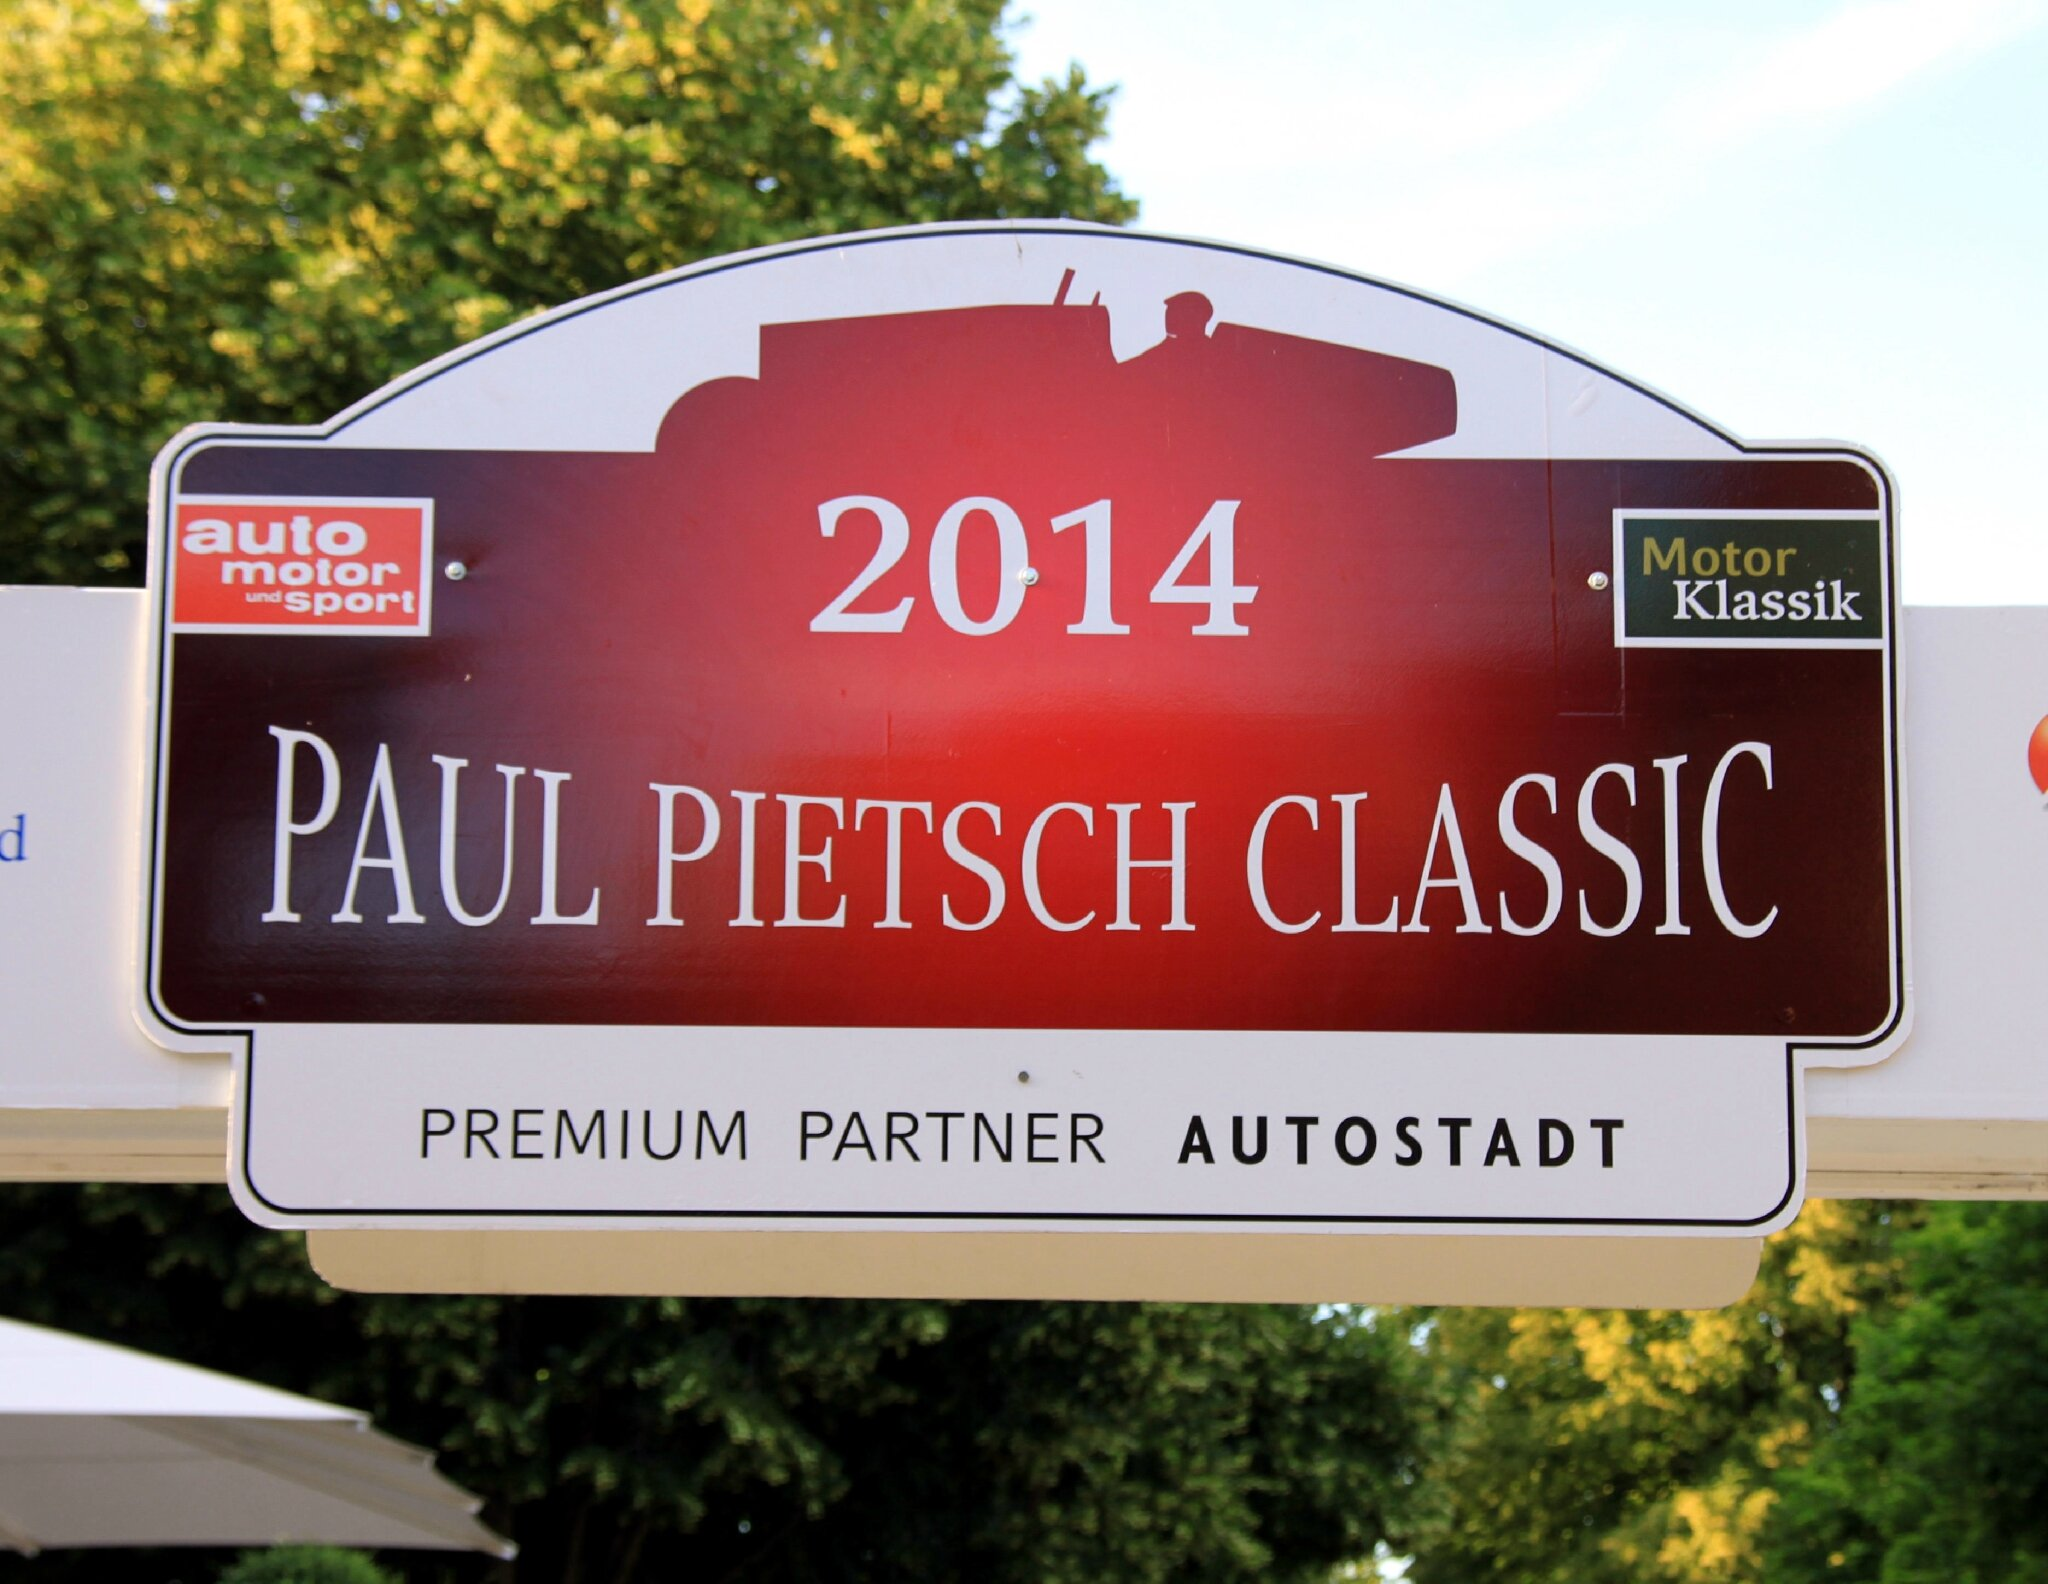 Paul Pietsch Classic 2014